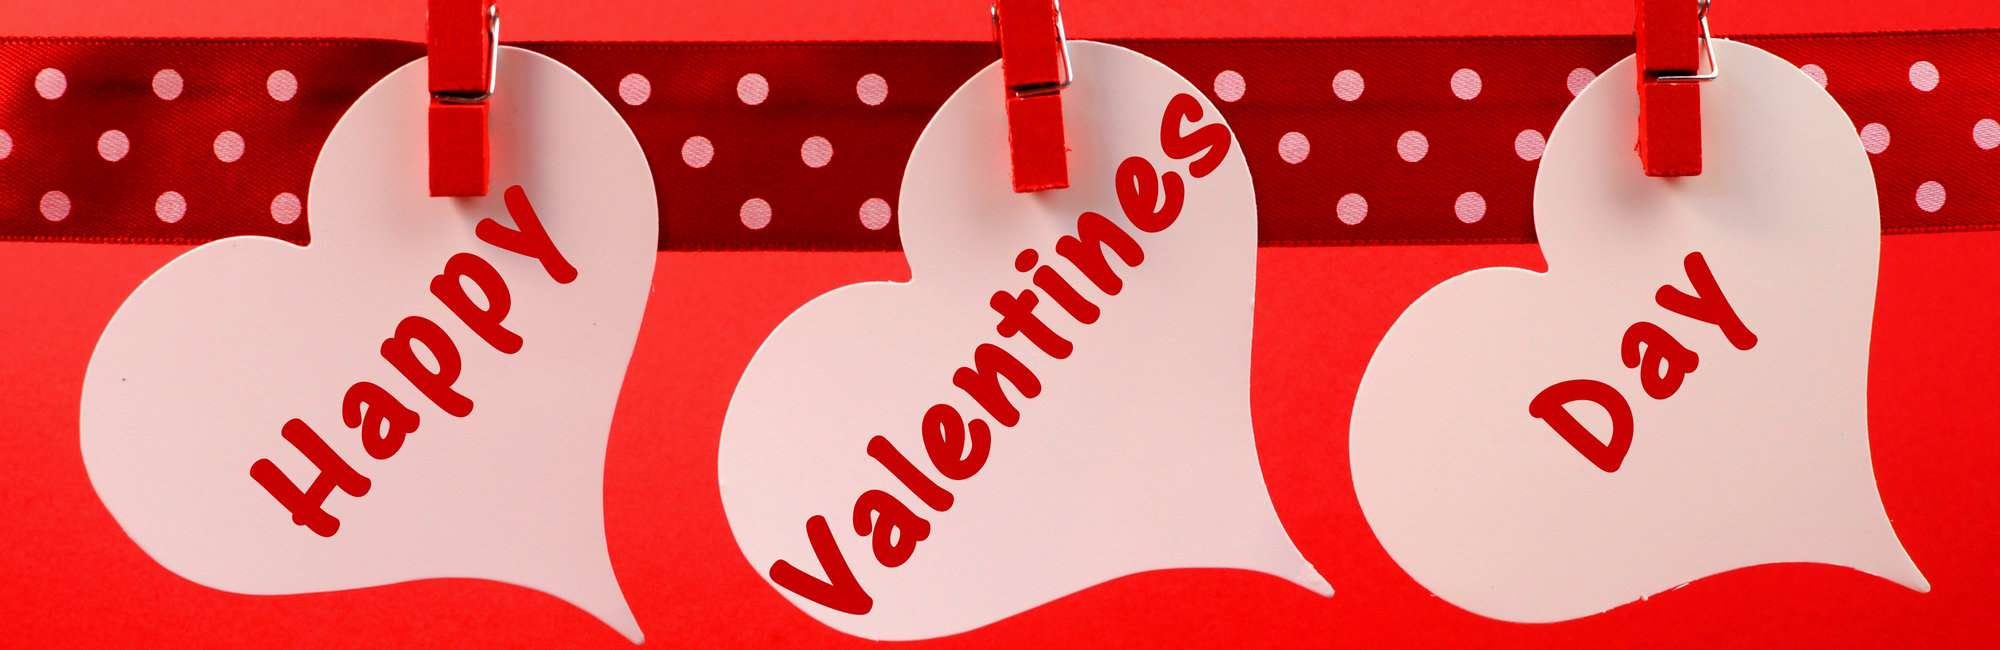 Slide-Events-Valentines-Day